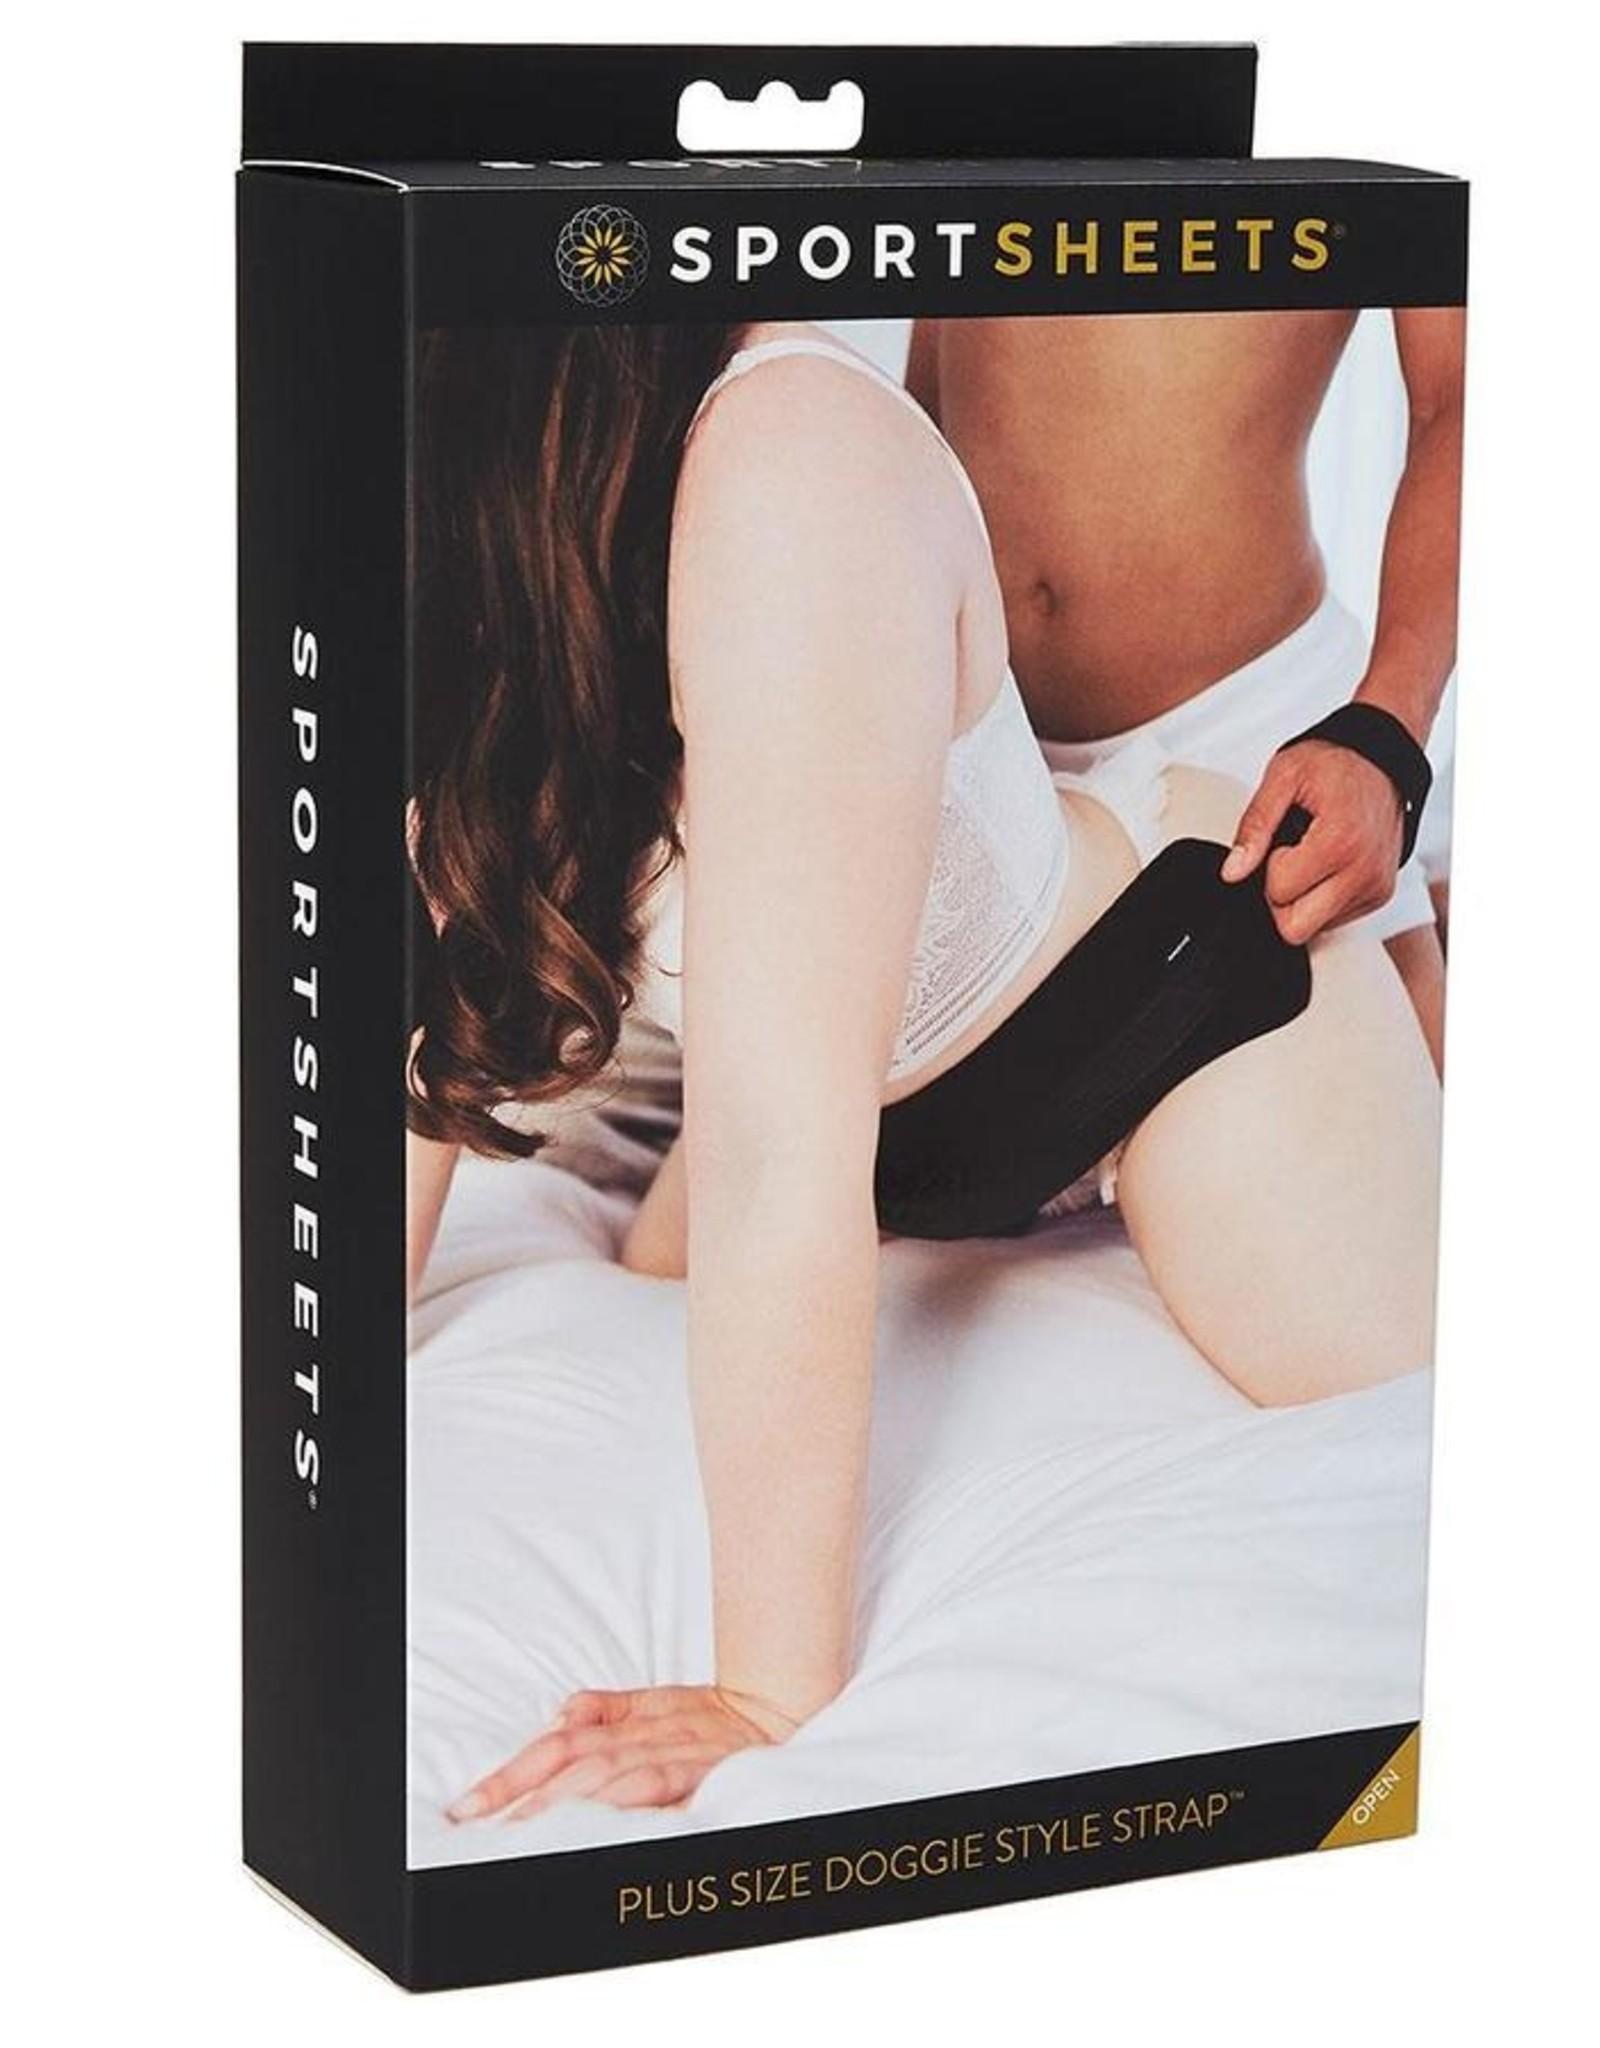 Sportsheets Doggie Style Strap Plus Size